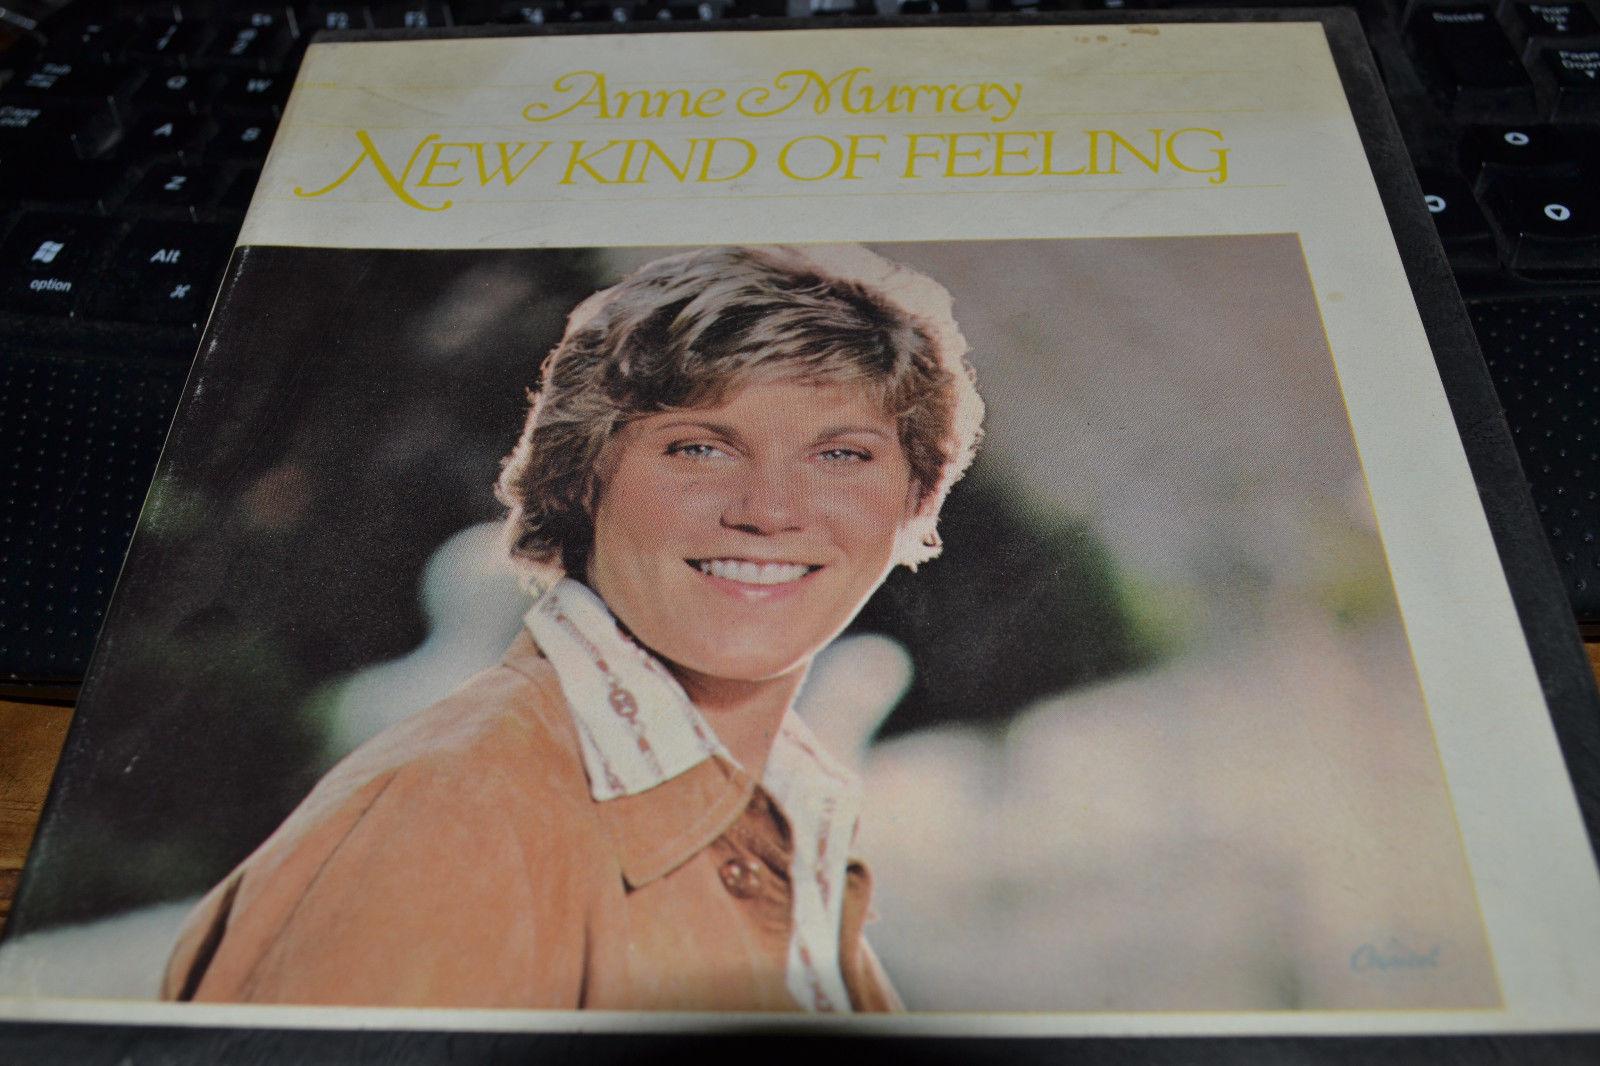 ANNE MURRAY - NEW KIND OF FEELING -  REEL TO REEL TAPE  3 3/4